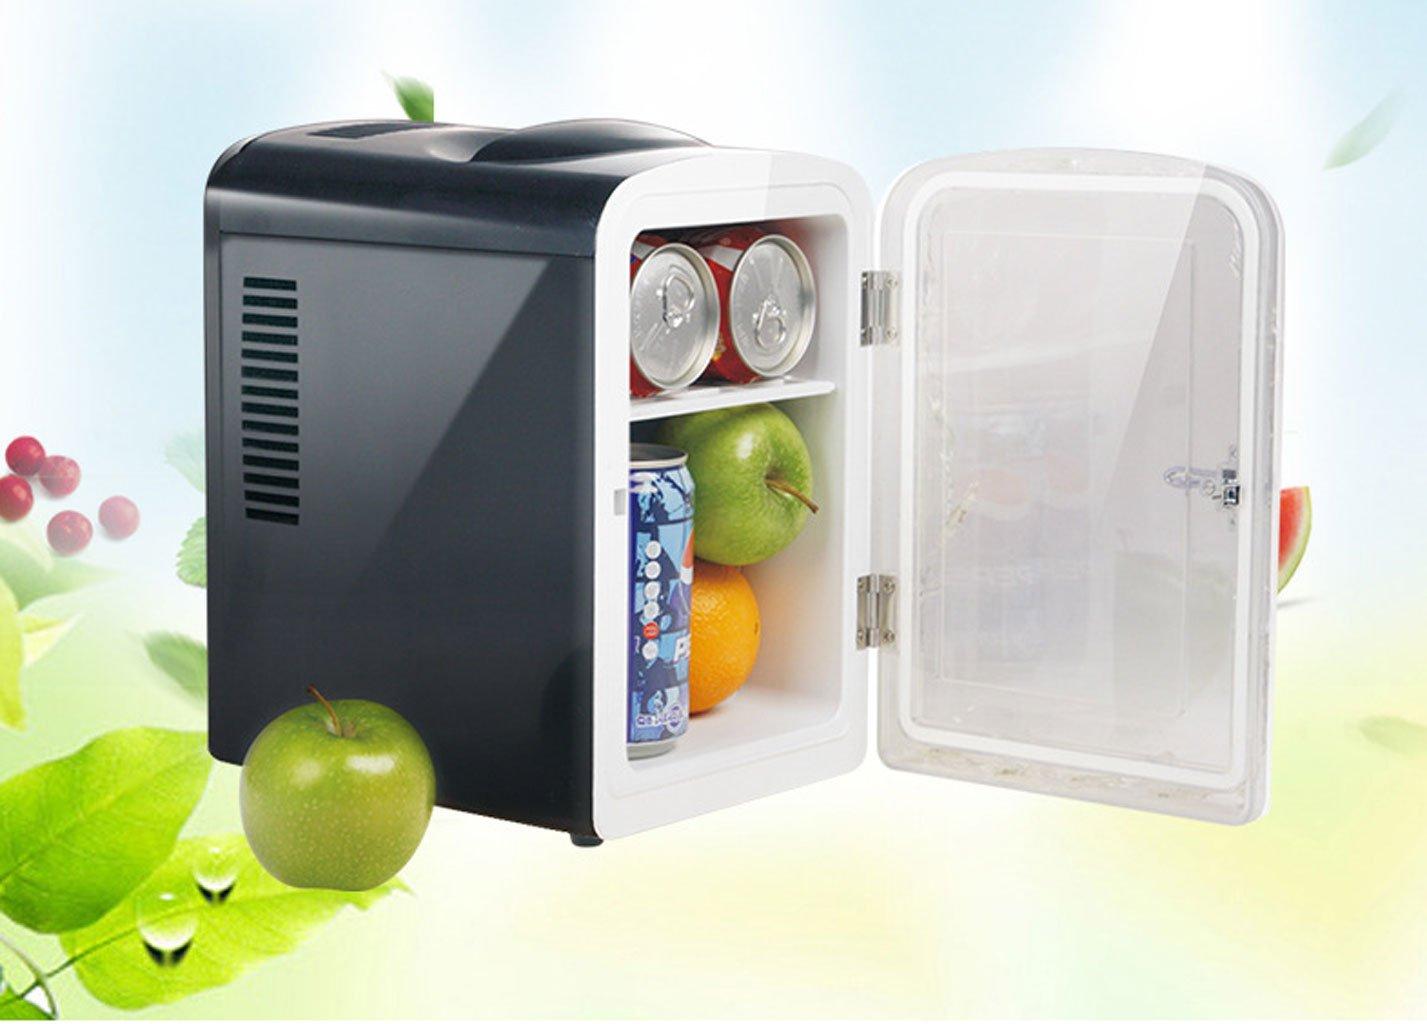 Siemens Kühlschrank Heiß : Bosch kühlschrank heiß bosch kühlschrank wird heiß kühlschrank